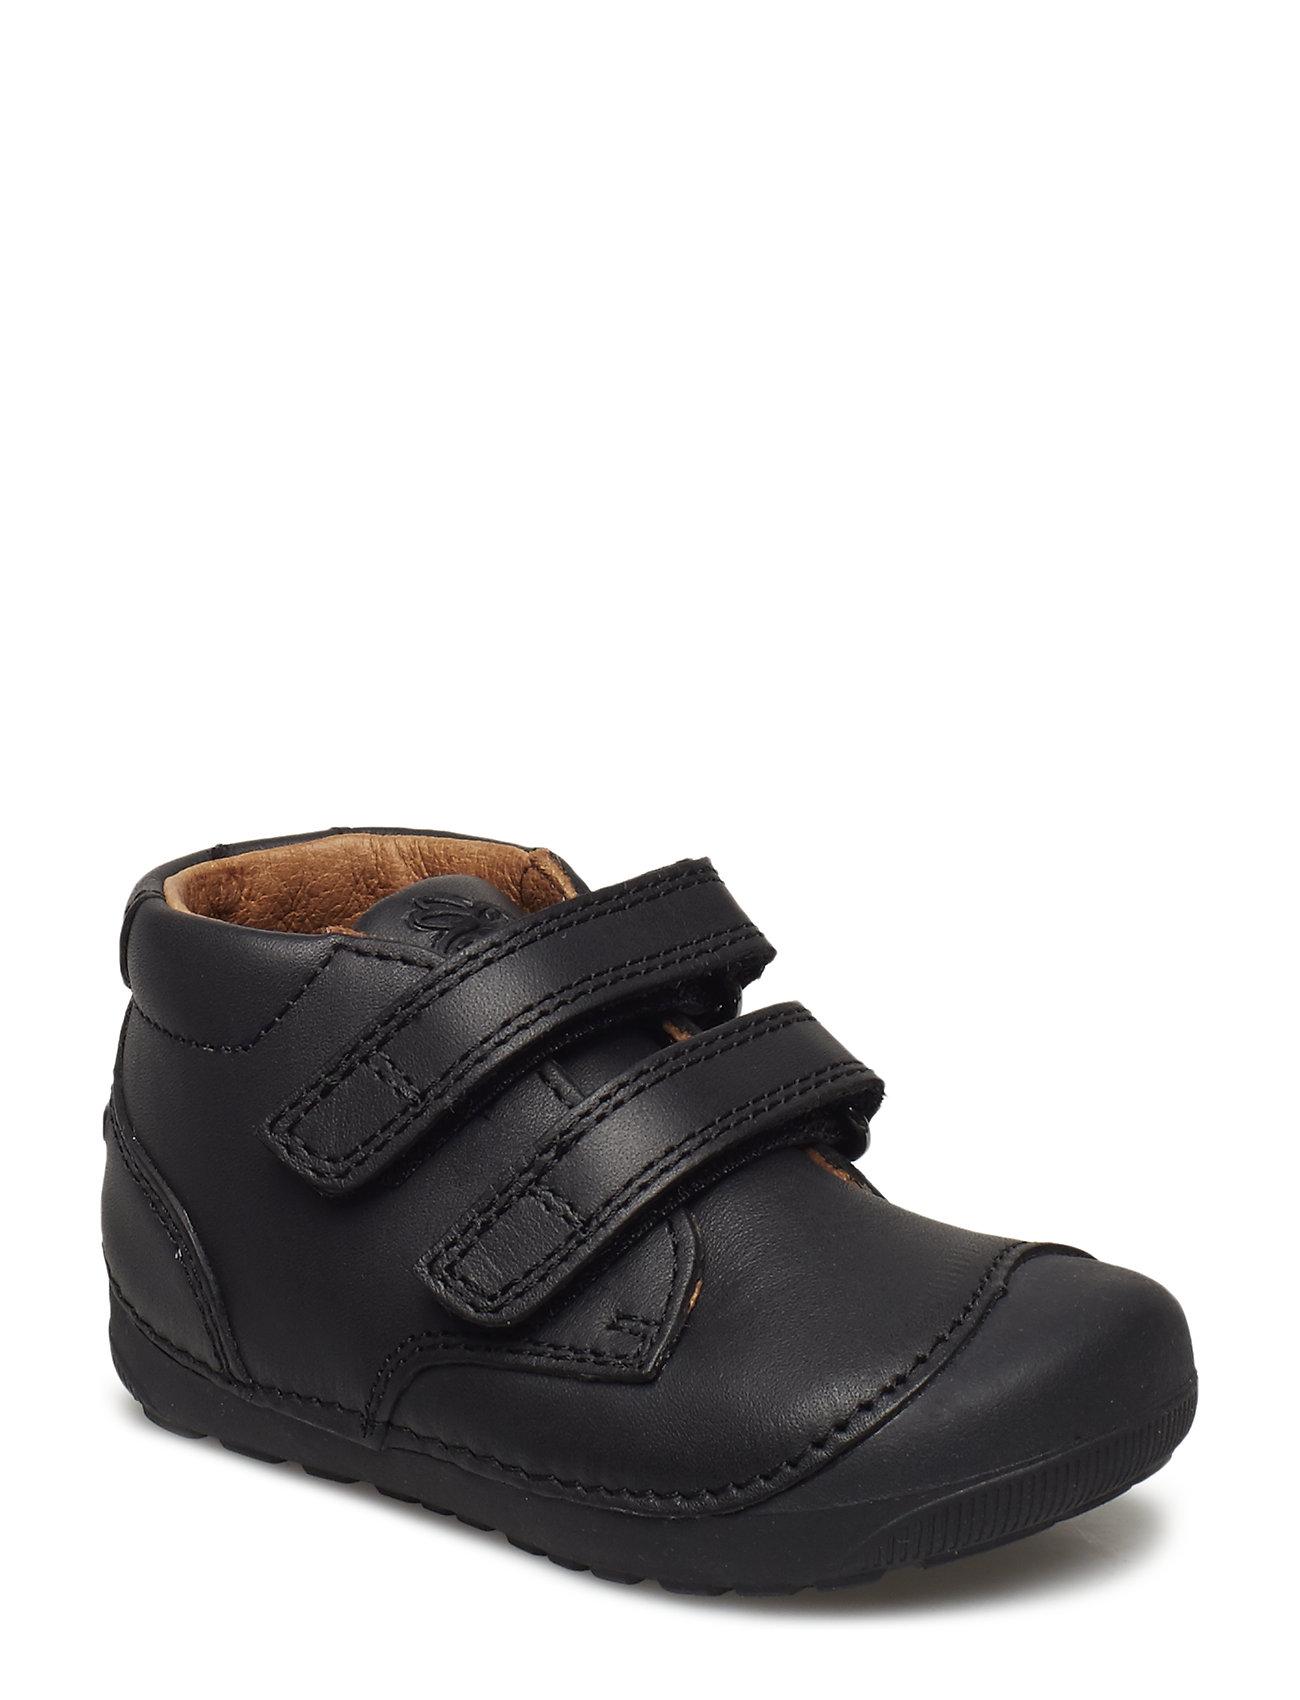 Bundgaard Petit Velcro - BLACK/BLACK